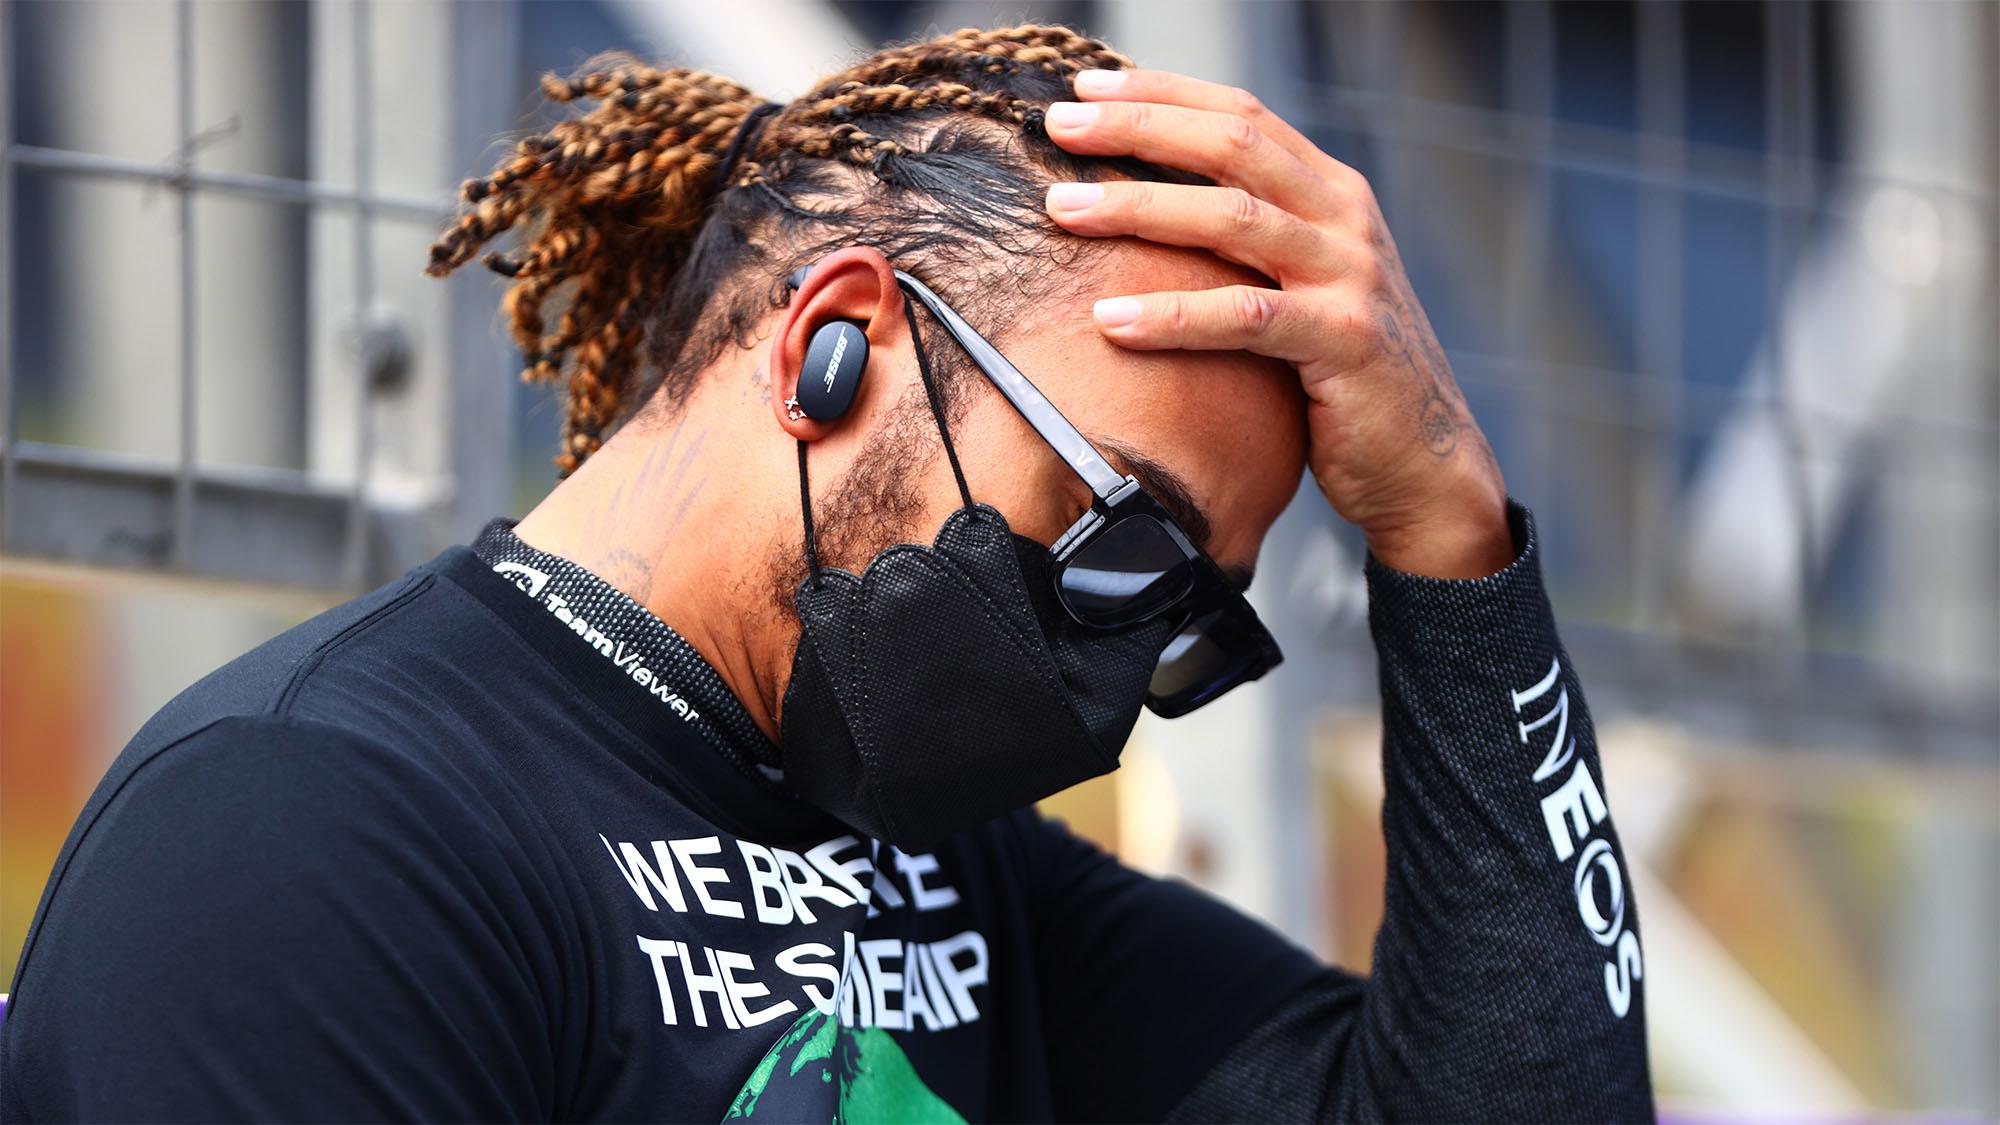 How the sound of radio silence betrayed Hamilton's emotions in Baku